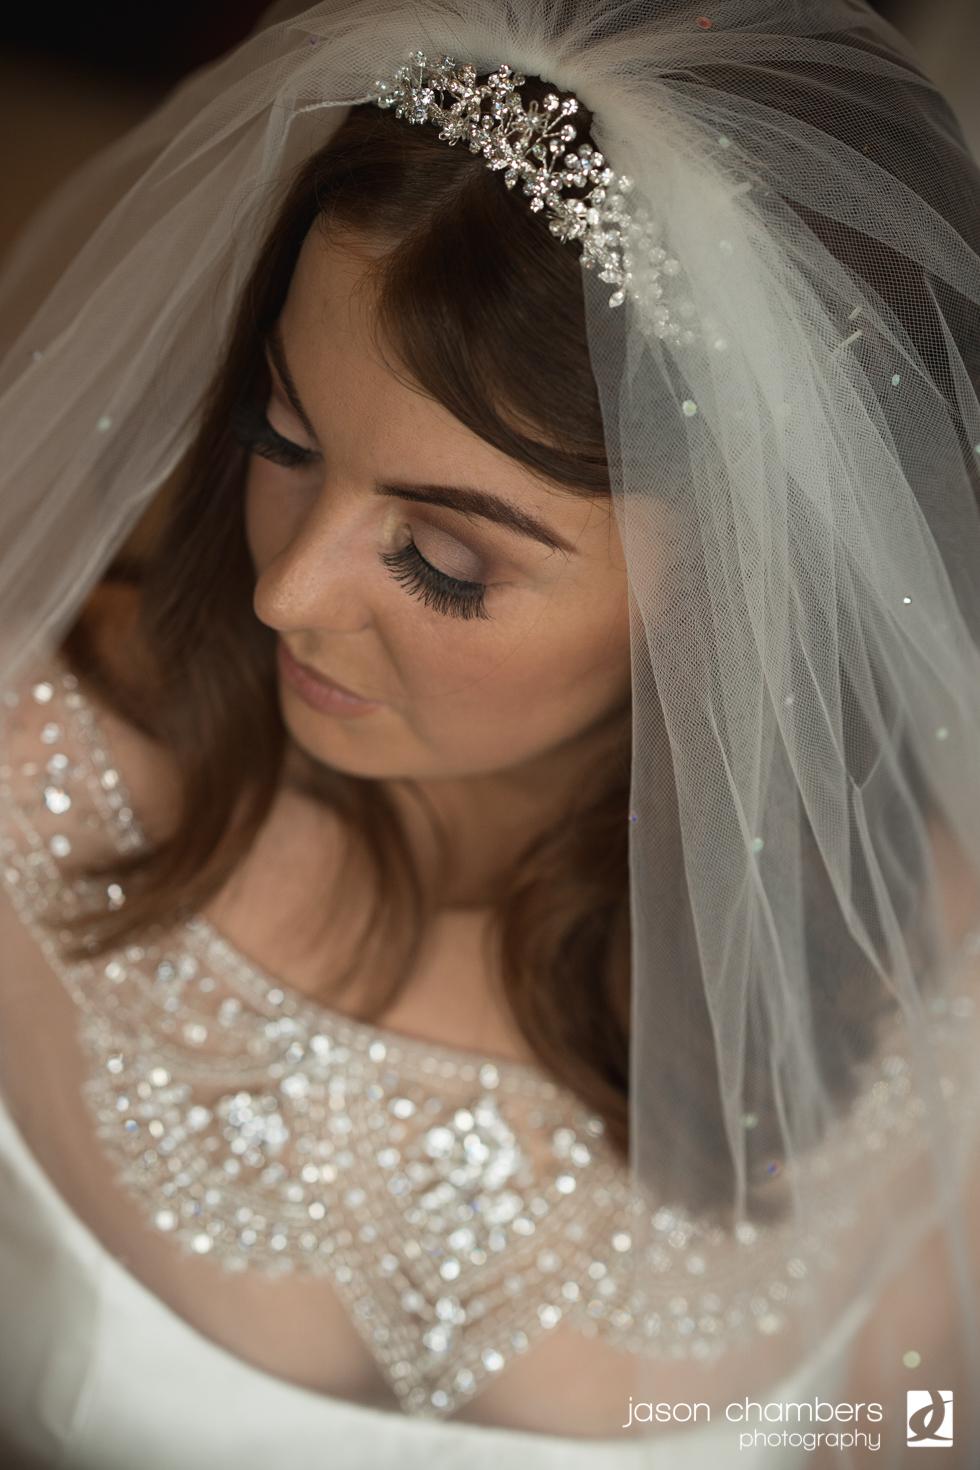 Bridal Photographs at Armathwaite Hall